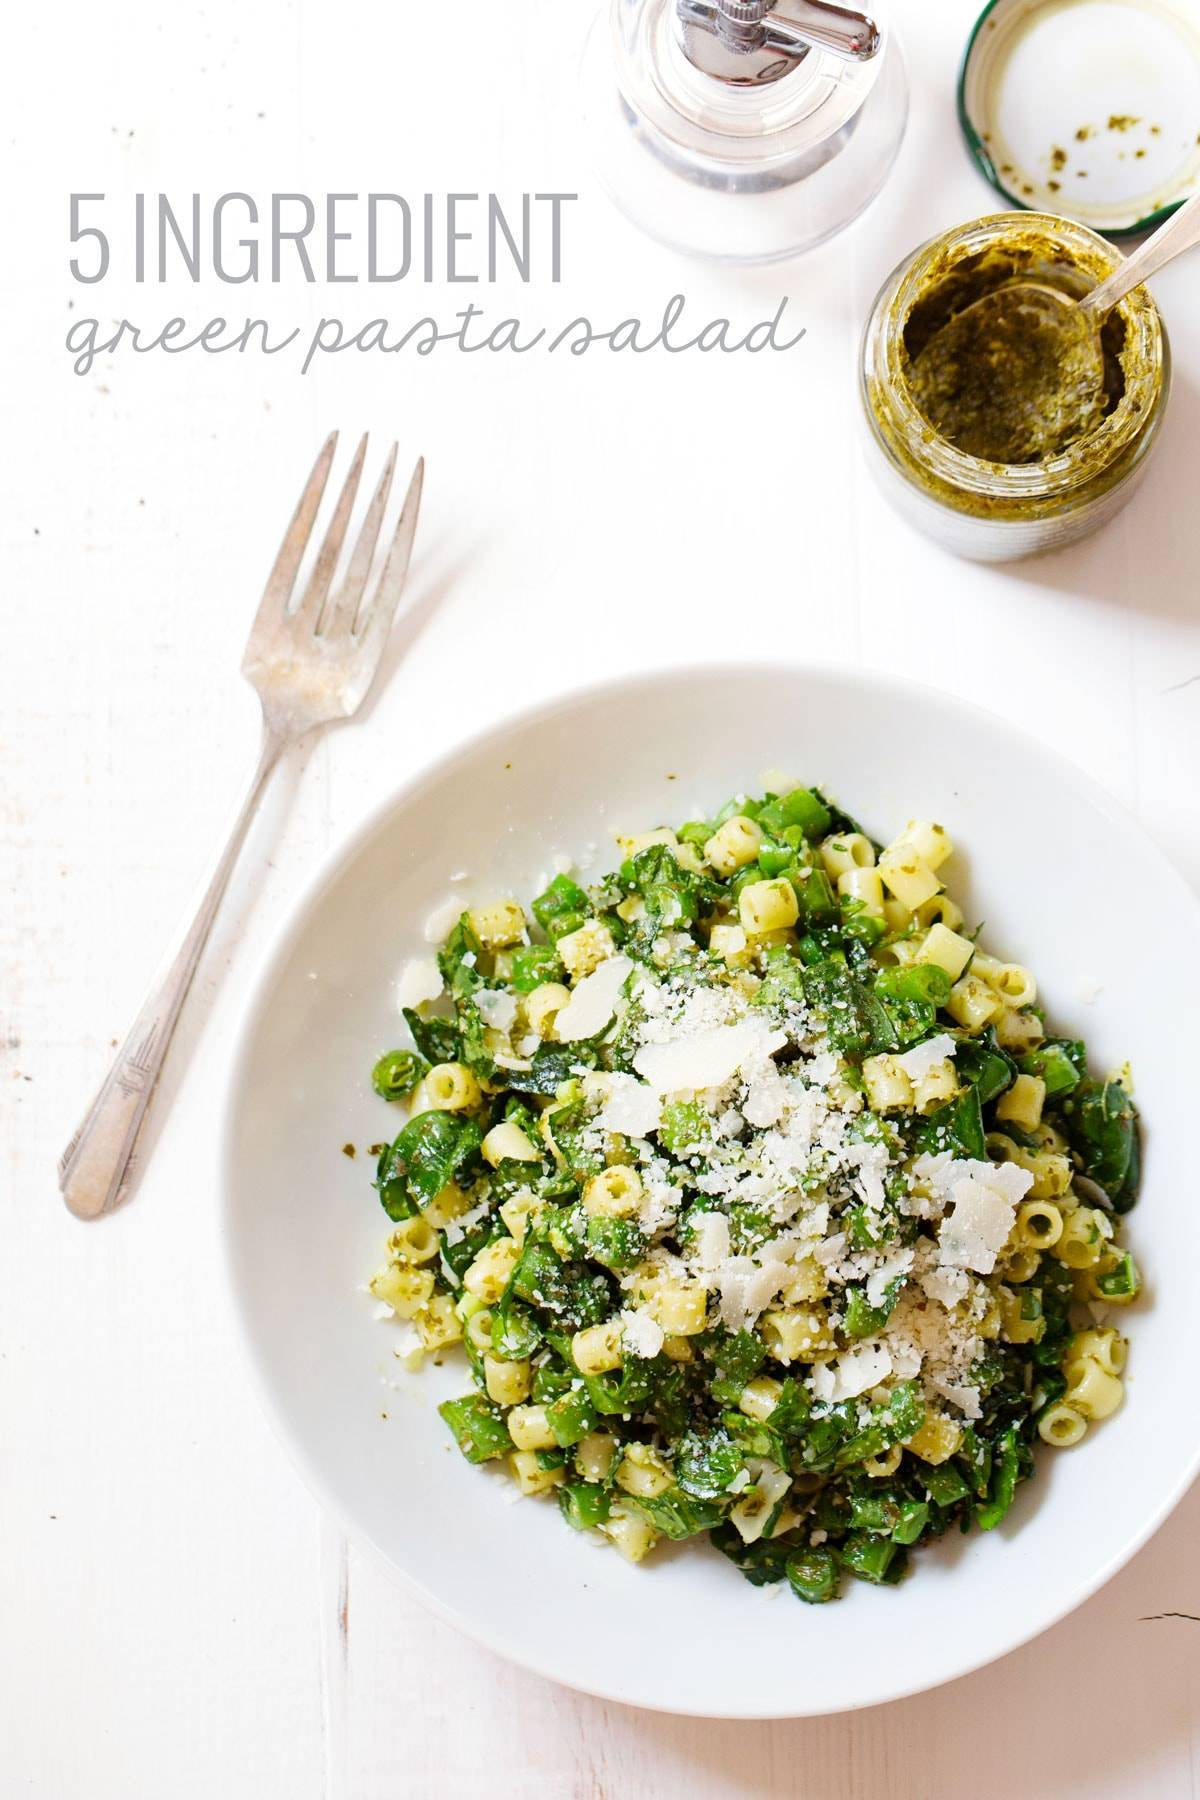 Five Ingredient Simple Green Pasta Salad - basil, olive oil, garlic, and lemon juice flavor this fresh, yummy, simple summer dish! | pinchofyum.com #pasta #salad #healthy #recipe